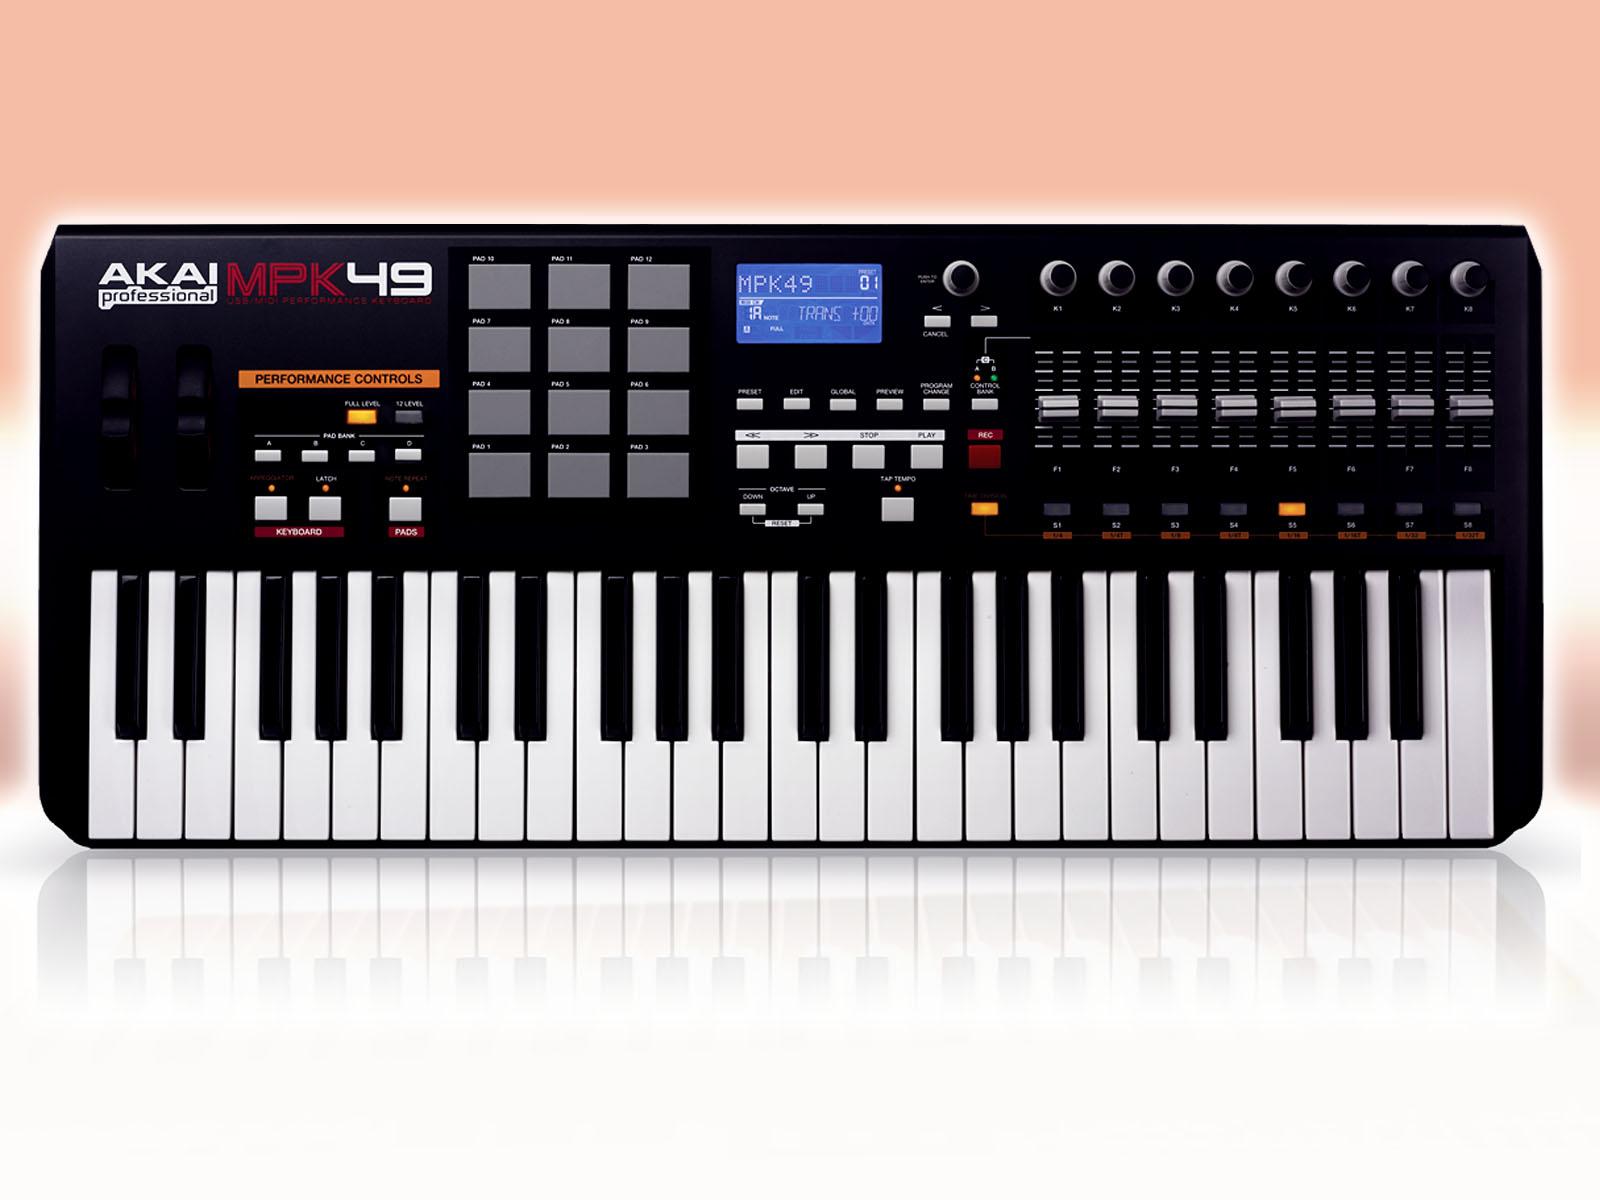 B Best 49 Key MIDI Keyboard Of 2012 Under $300 - Music /b